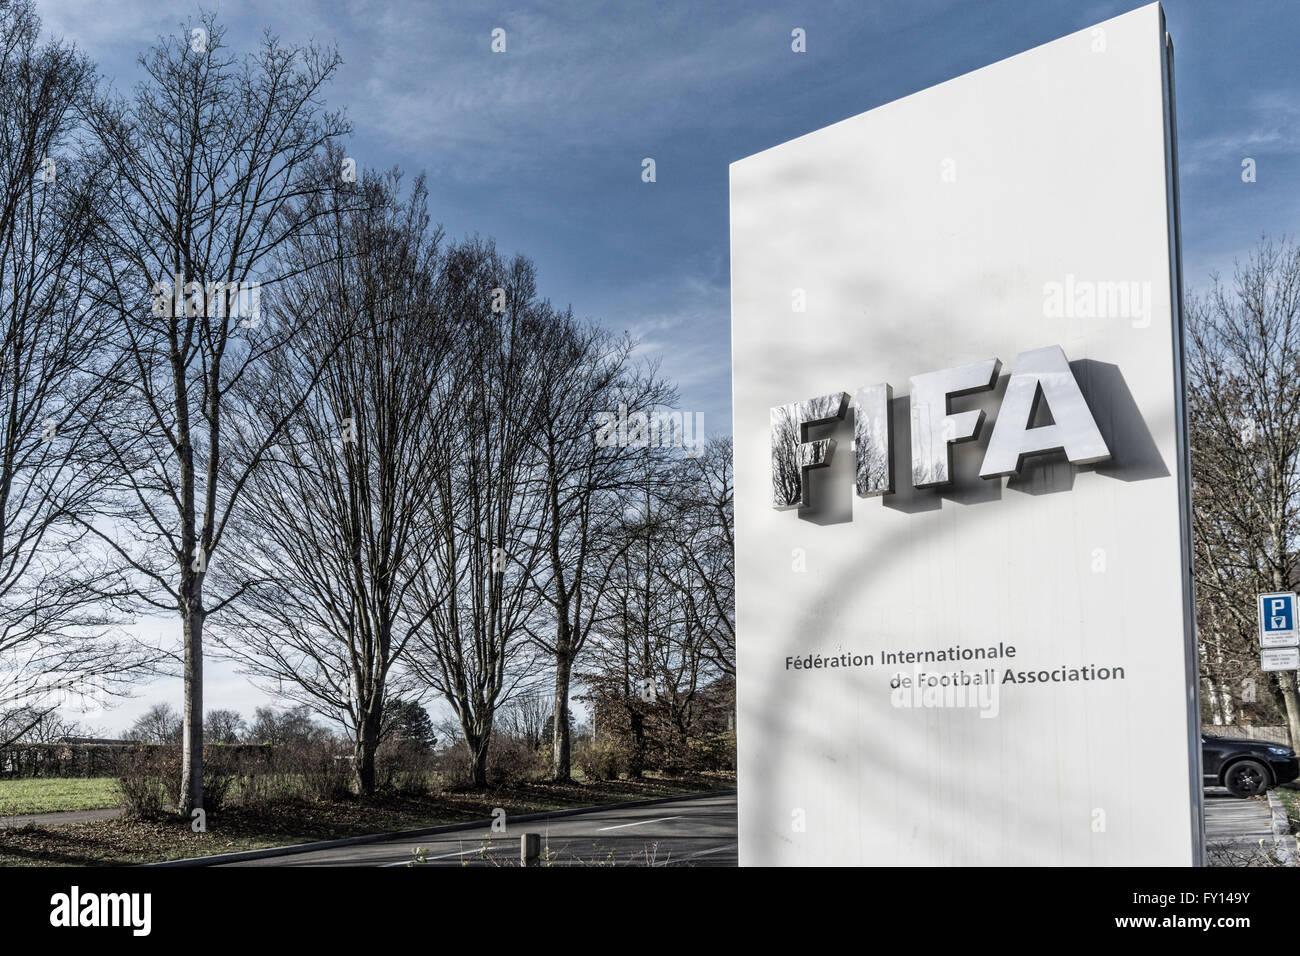 La FIFA, la Fédération Internationale de Football Association, Zurich Imagen De Stock